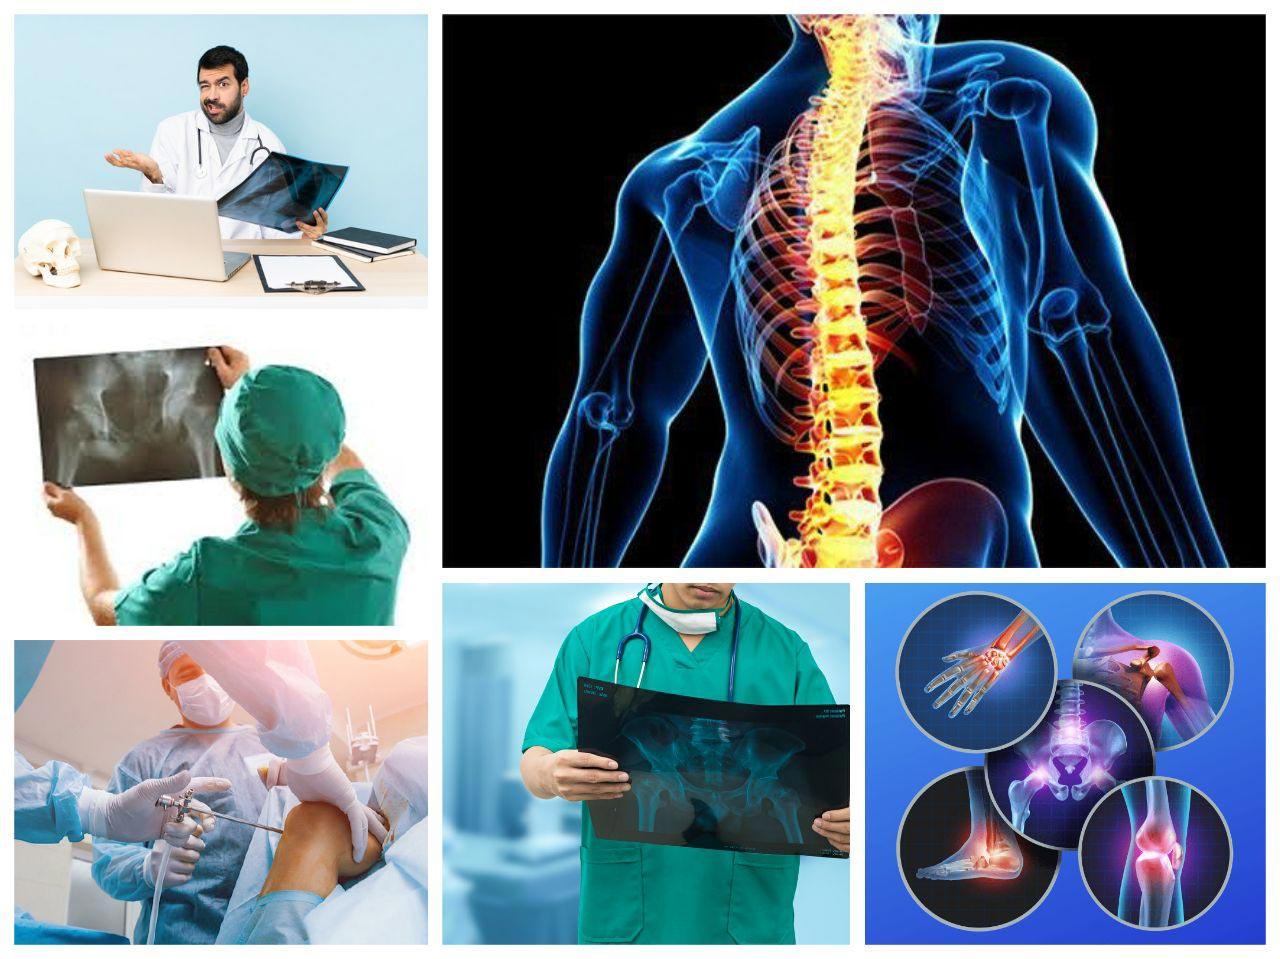 Orthopedist and joint and bone surgeon